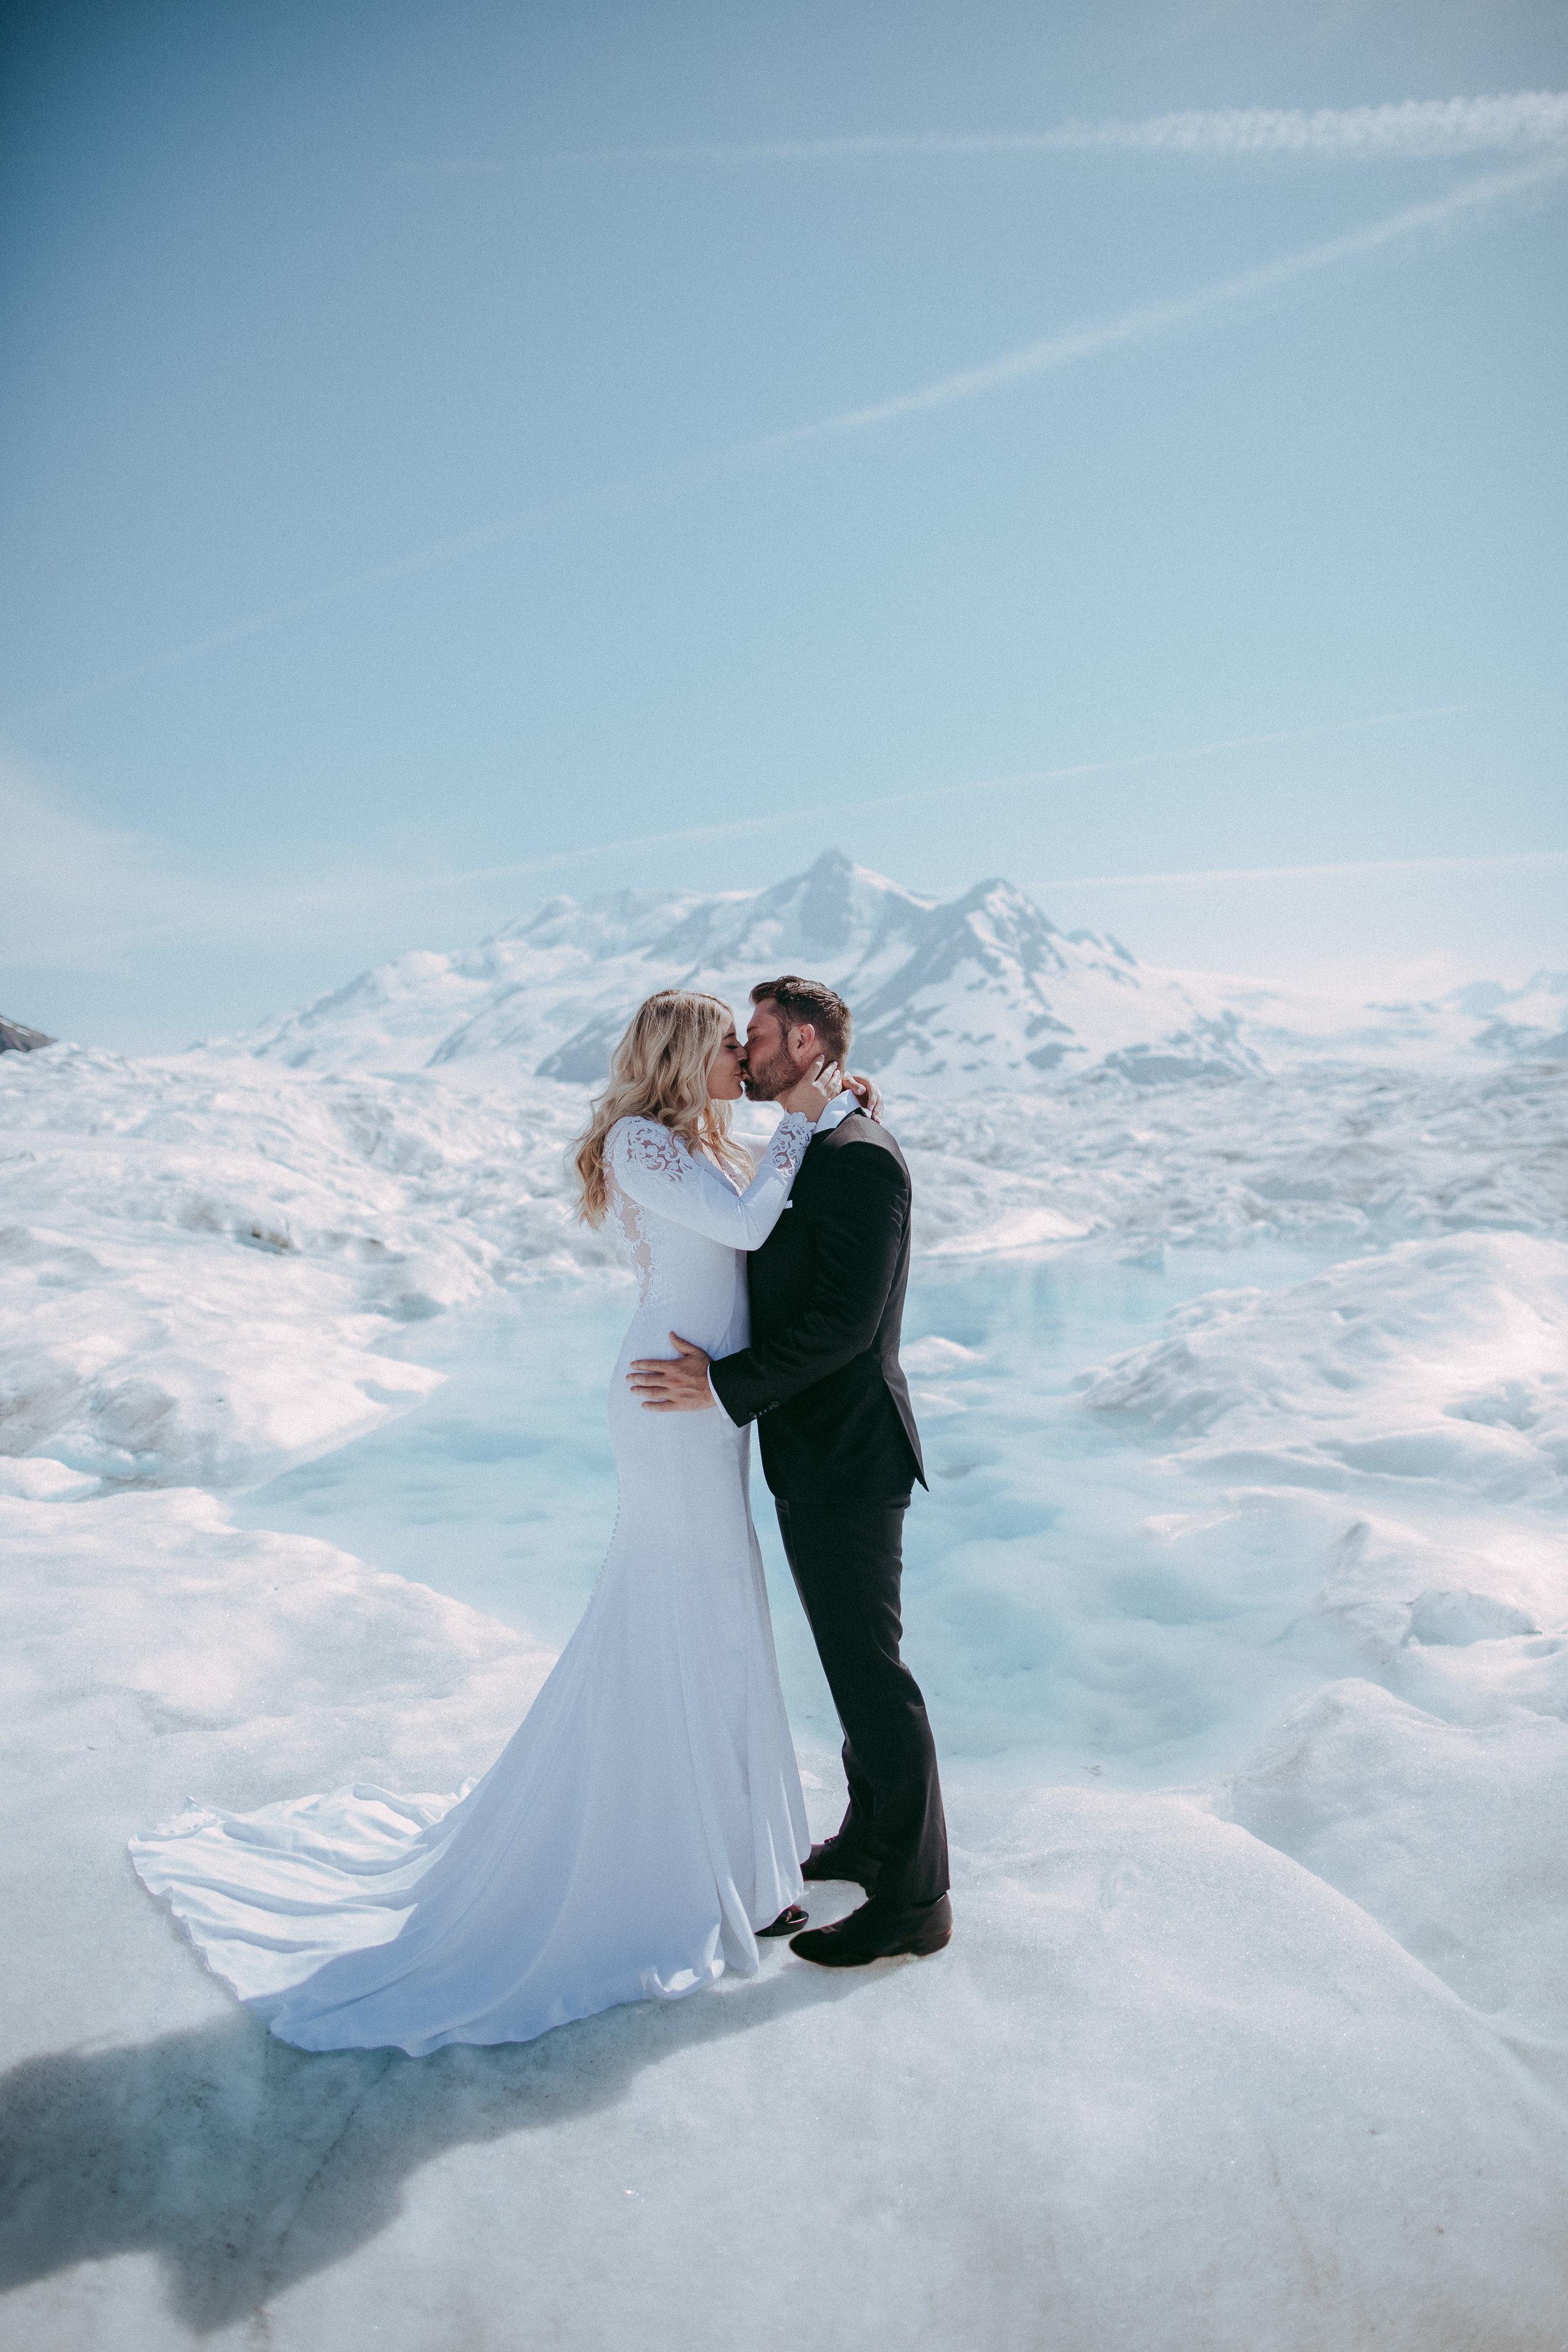 Aaron & Kylie - Girdwood, Alaska 2019